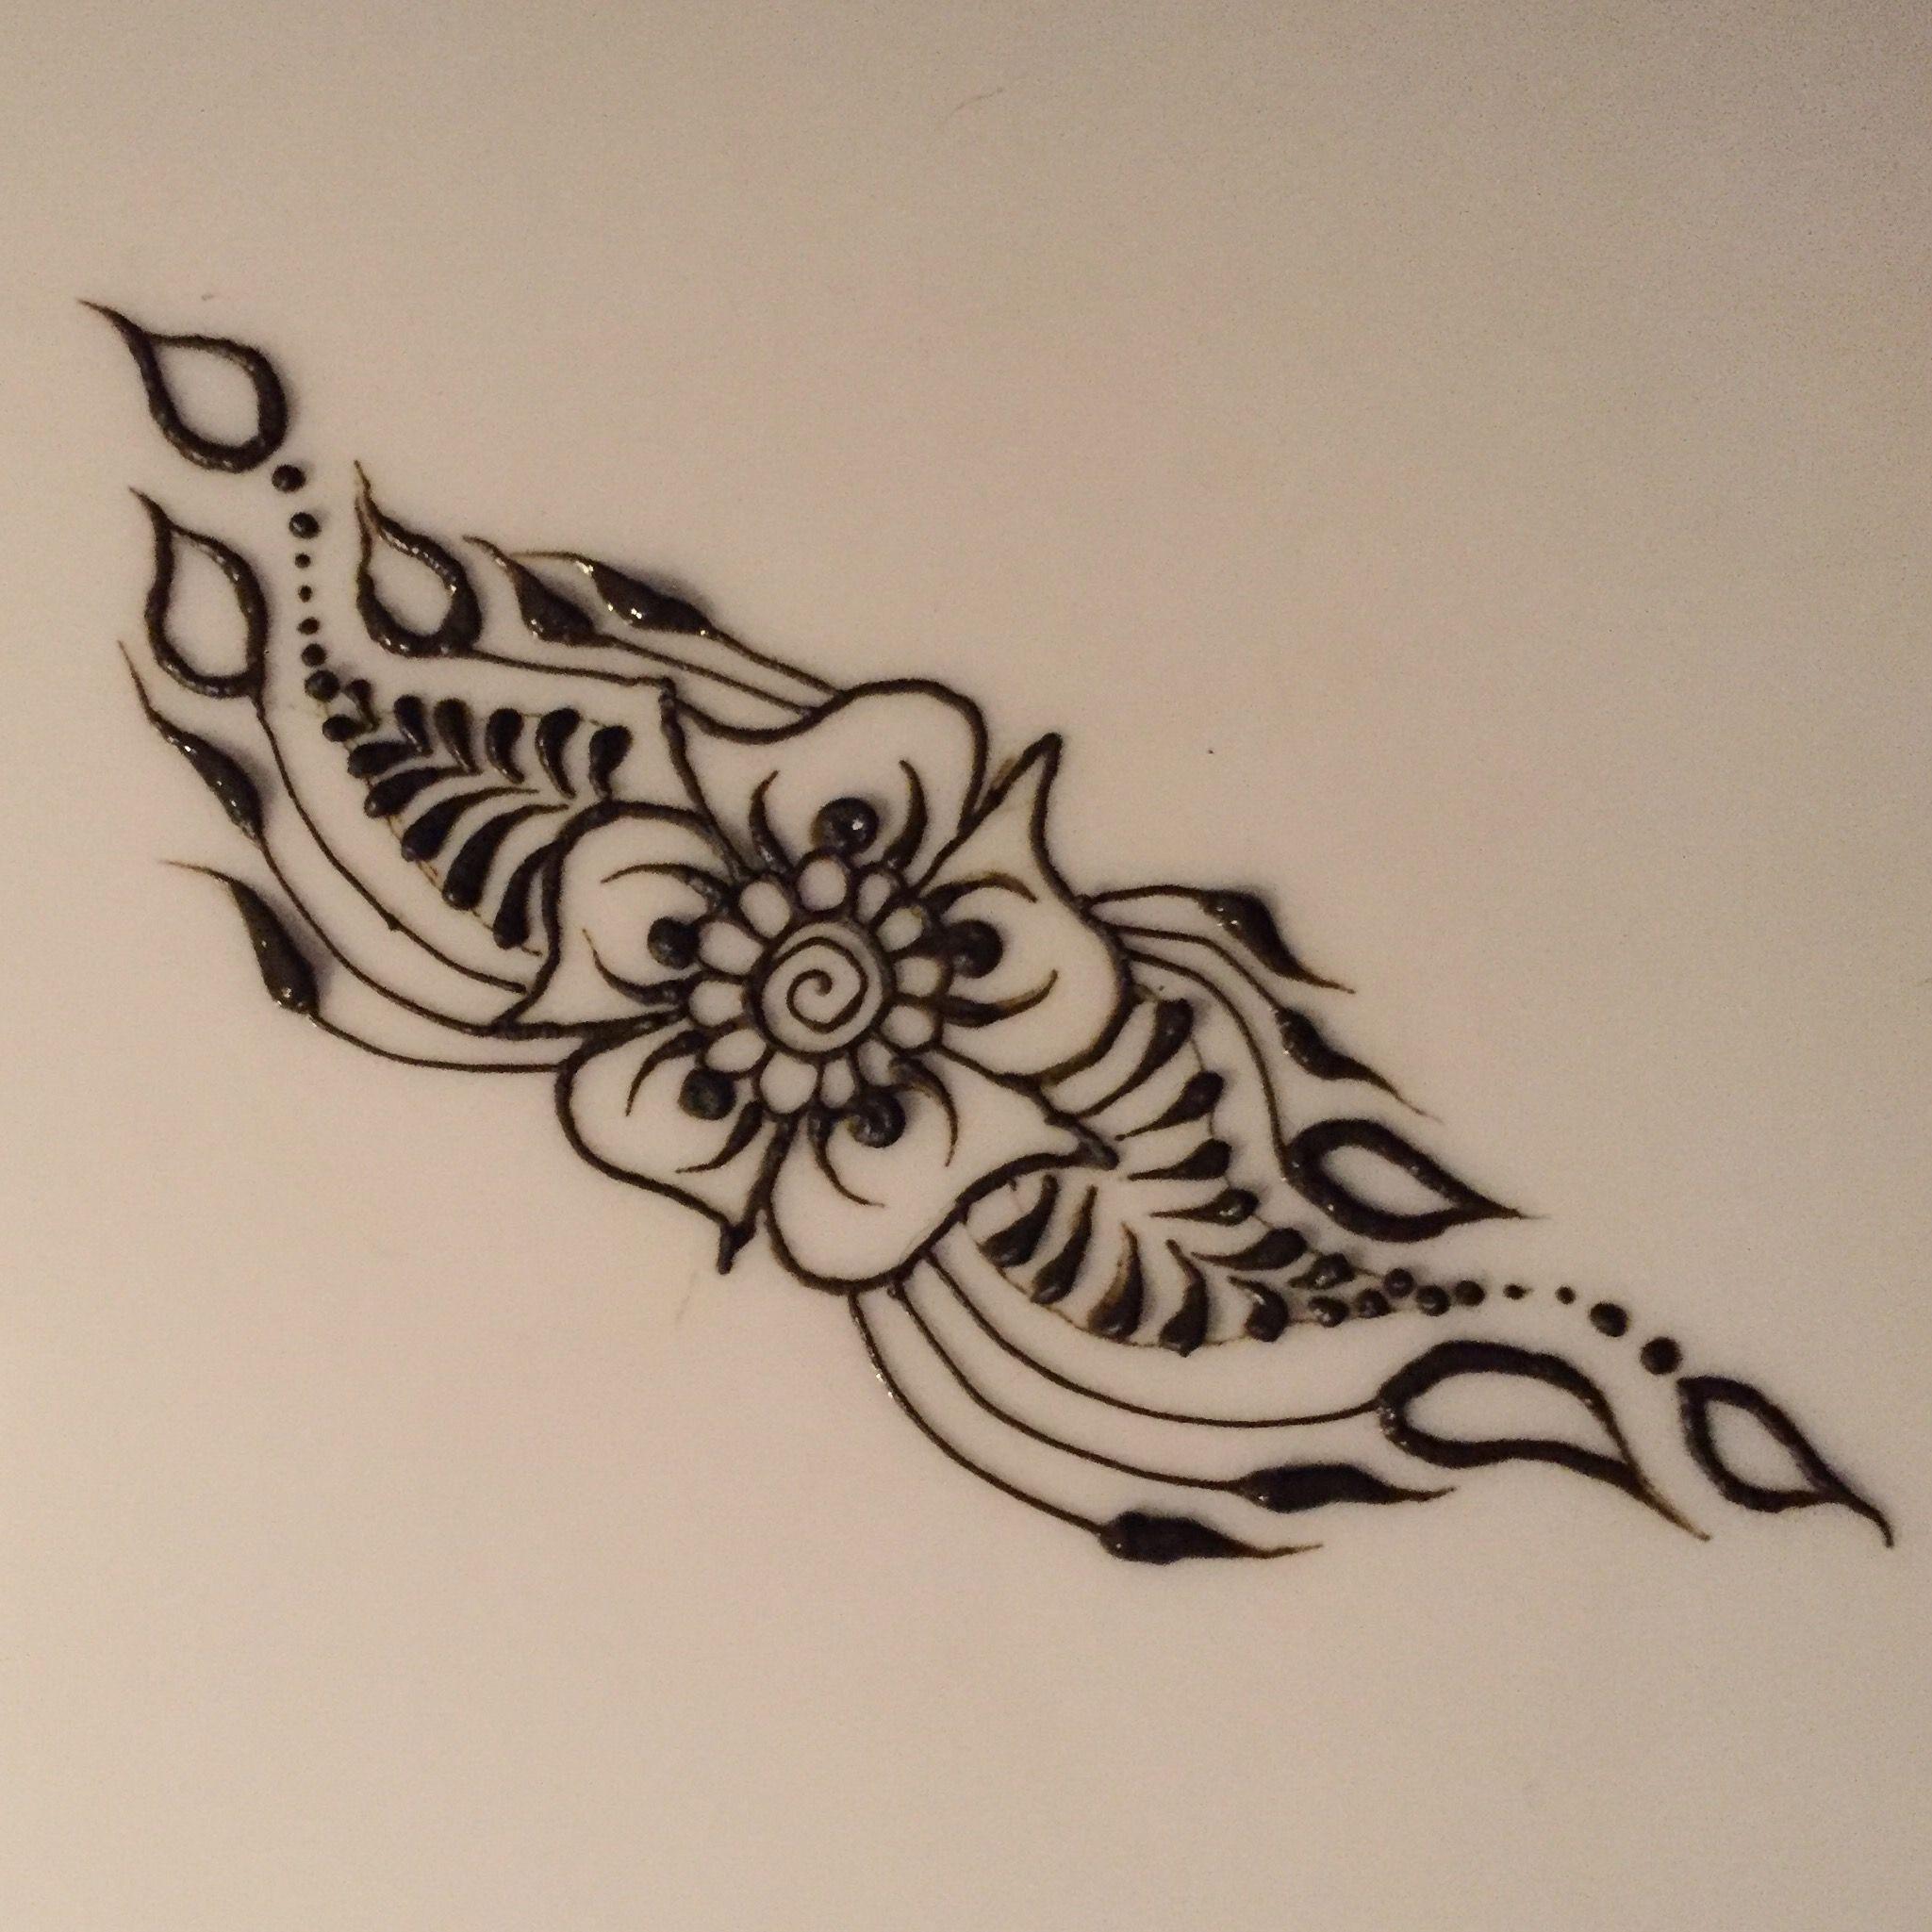 Pin By Henna On Fast Easy Henna Designs Tribal Tattoos Hand Henna Henna Designs Easy